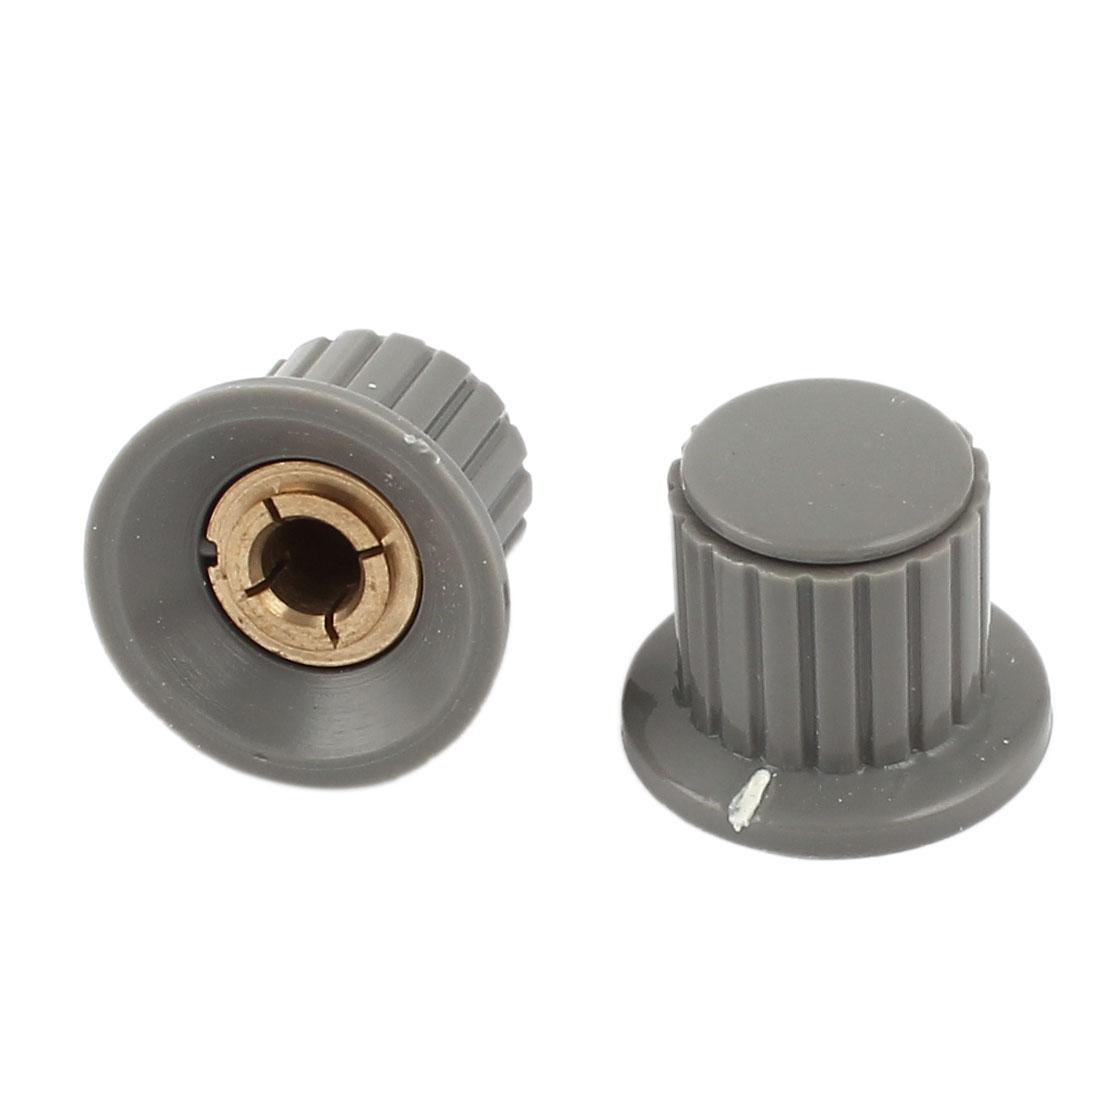 "2pcs 18.5mm Top 1/4"" Shaft Insert Dia Brass Tone Core Potentiometer Control Knob"